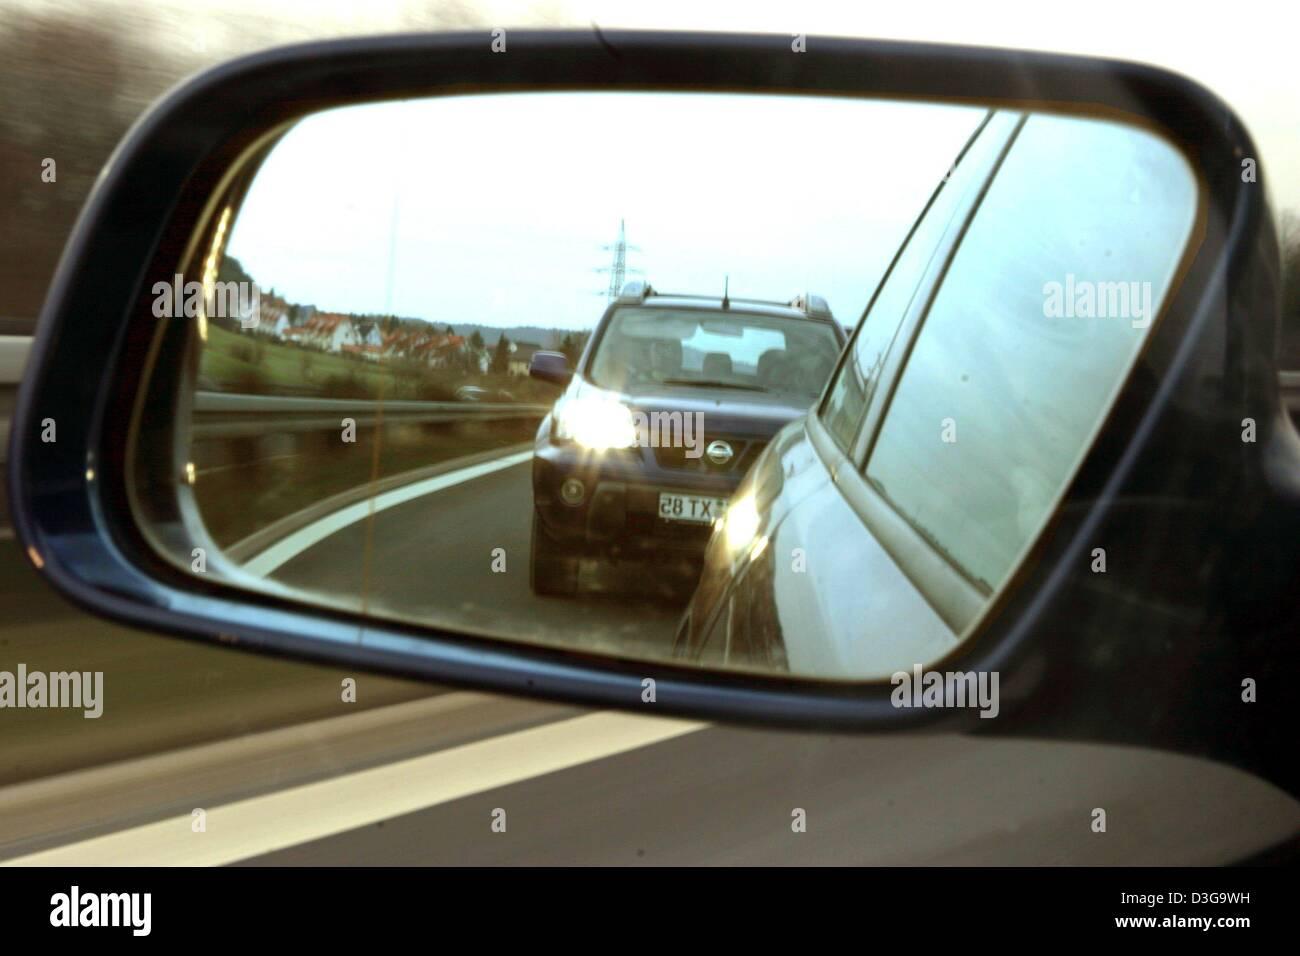 dpa files) - a following car flashing its headlights urges a stock